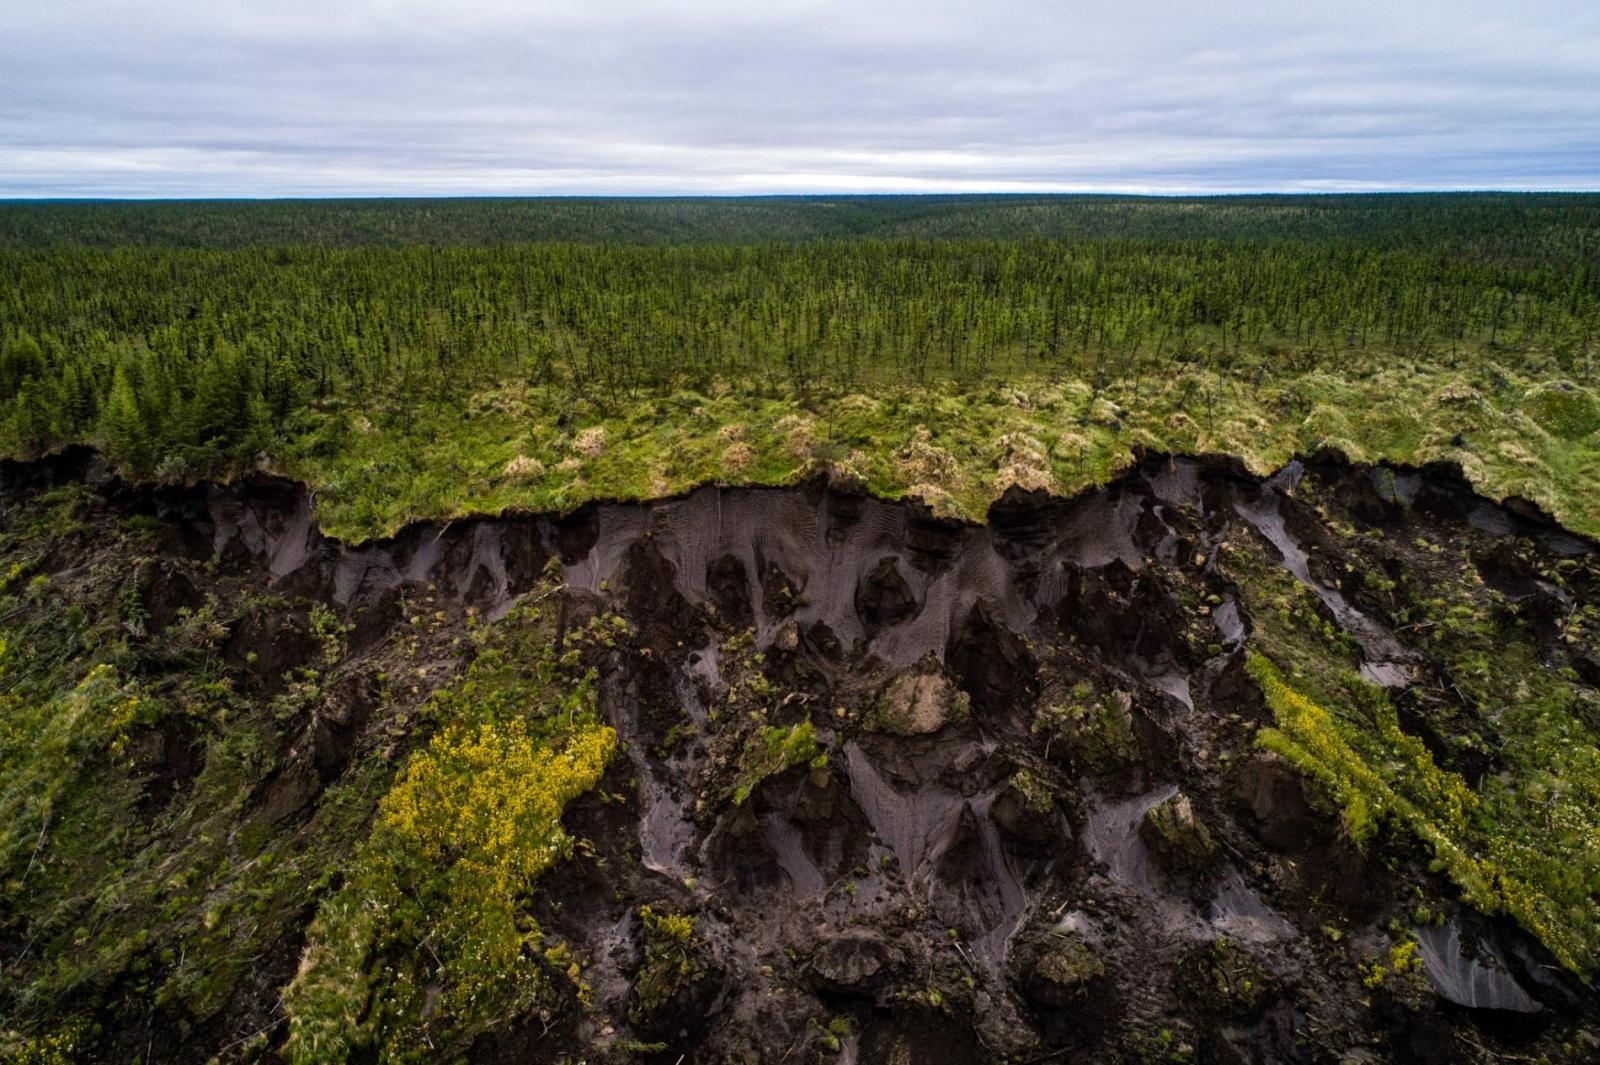 Photography image - Loading 01_permafrost_pleistocene-chersky-246.adapt.1900.1.jpg